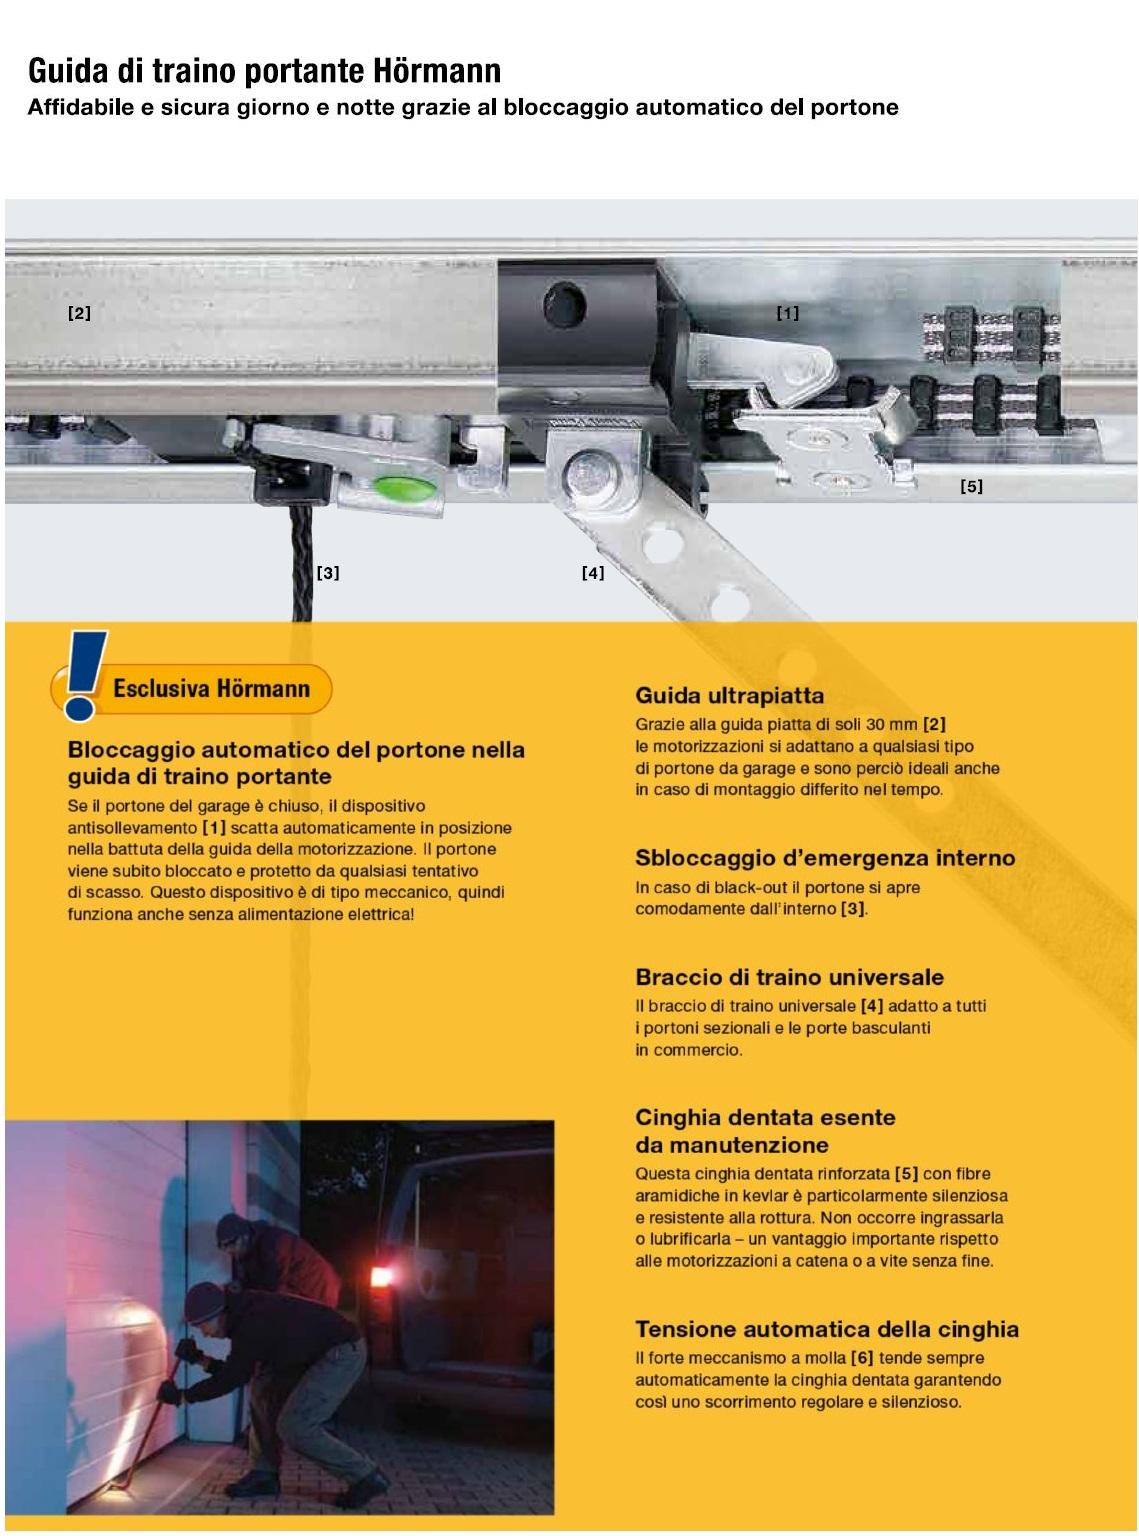 Schema Elettrico Hormann : Guida per motorizzazioni per porte da garage hormann maffei